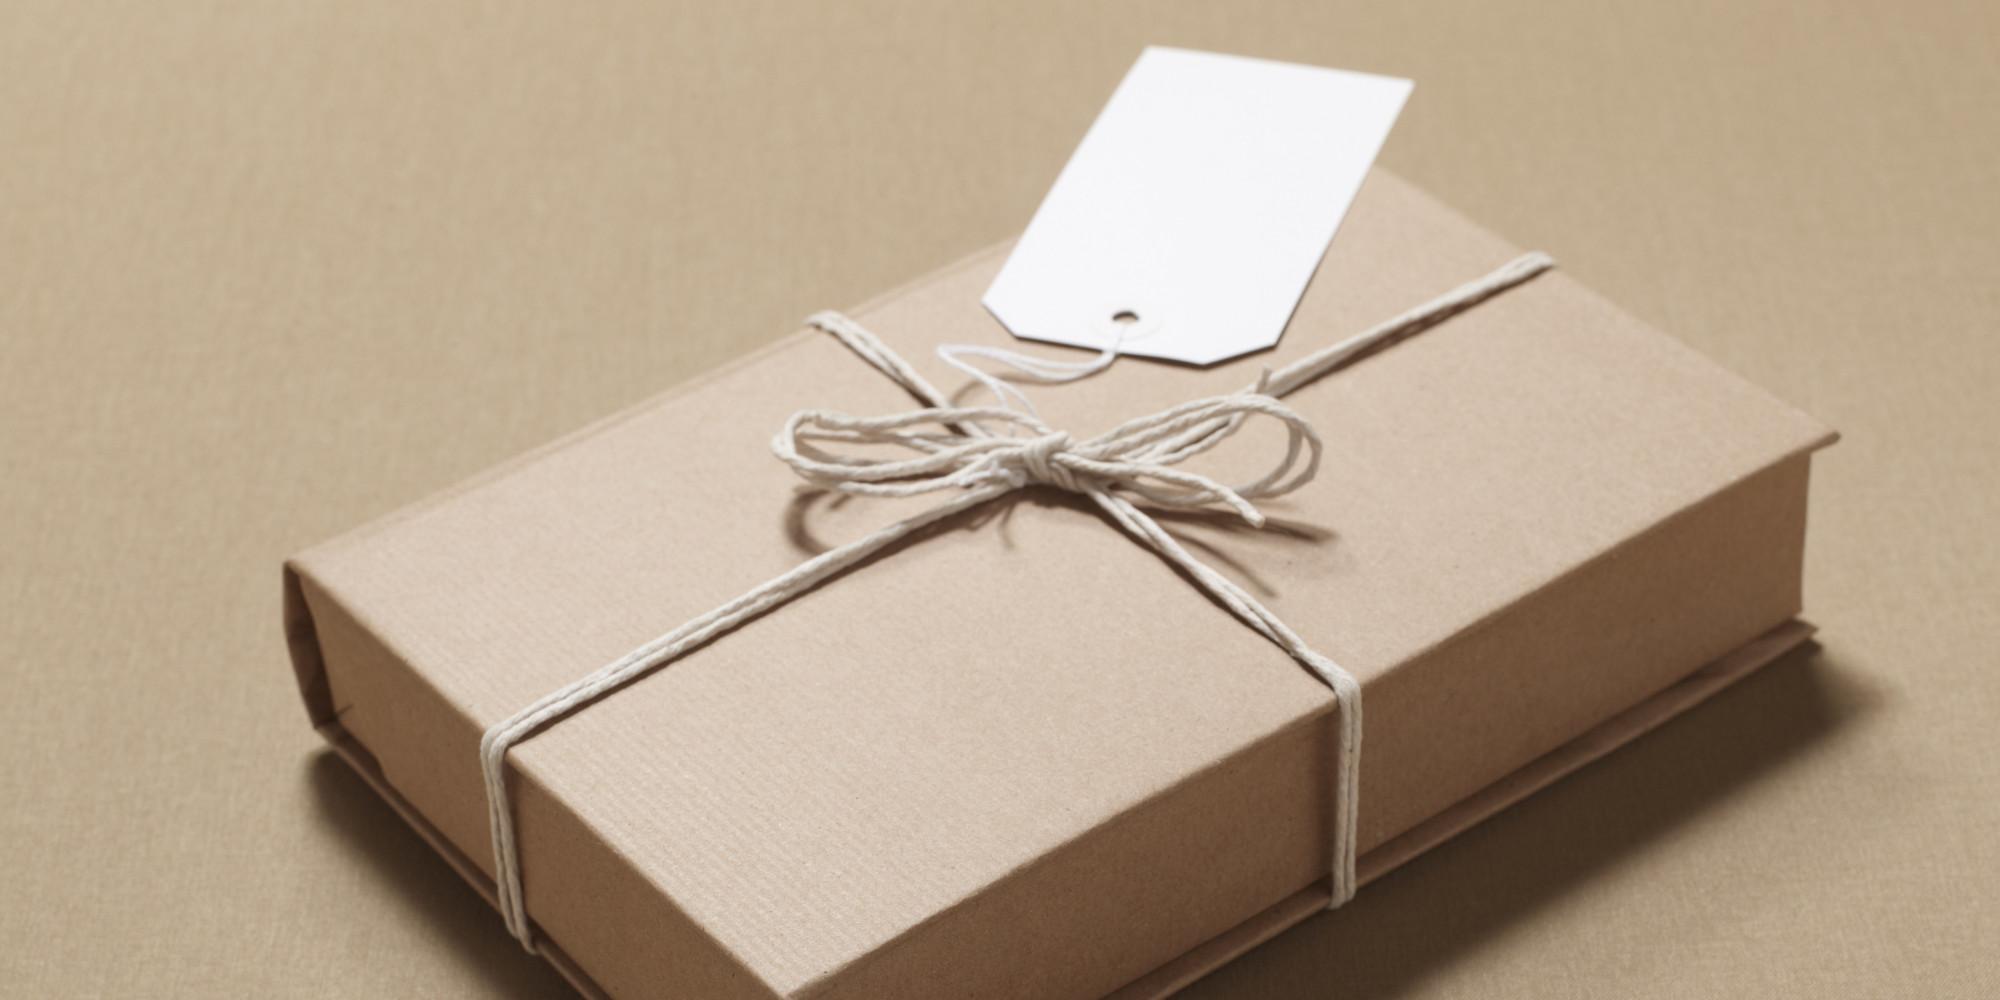 o-book-wrapped-gift-facebook